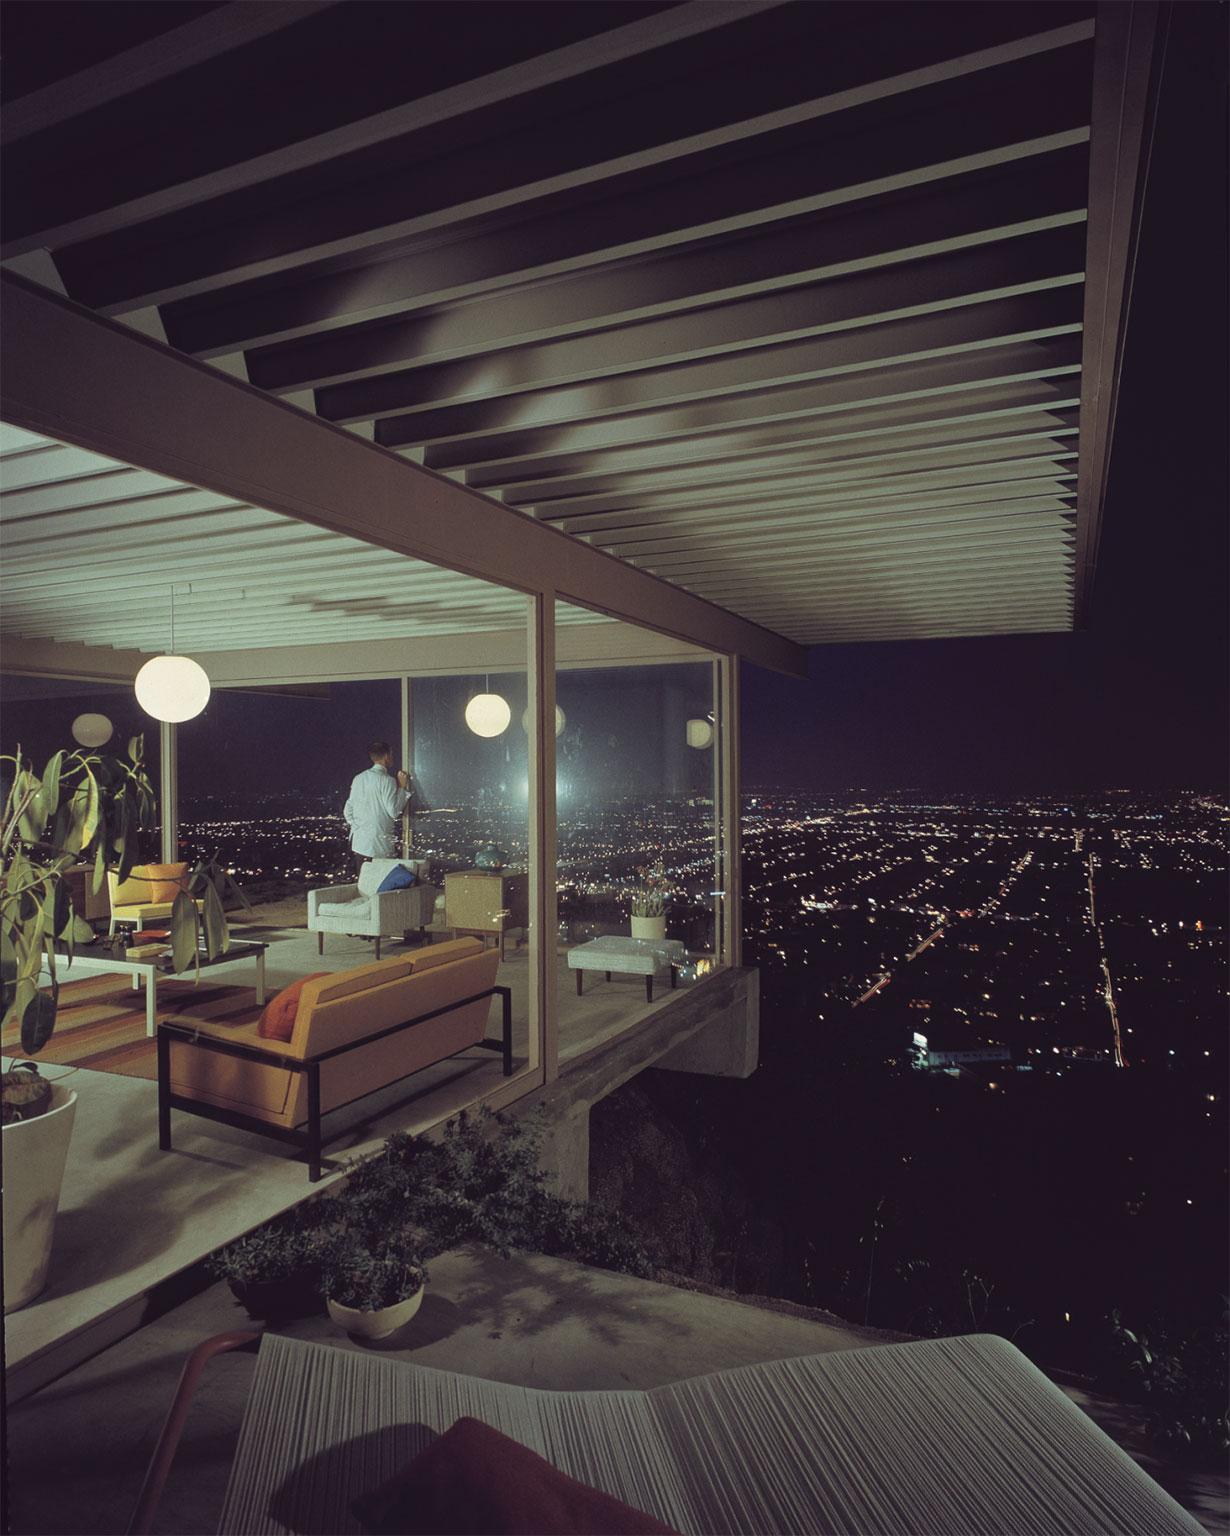 Shulman HERO MAGAZINE WEEKEND GUIDE 60'S ART BARBICAN ARCHITECTURE WORLD FURNITURE FASHION JAMES BROWN GET ON UP SOMERSET HOUSE SKATE SIGMAR POLKE